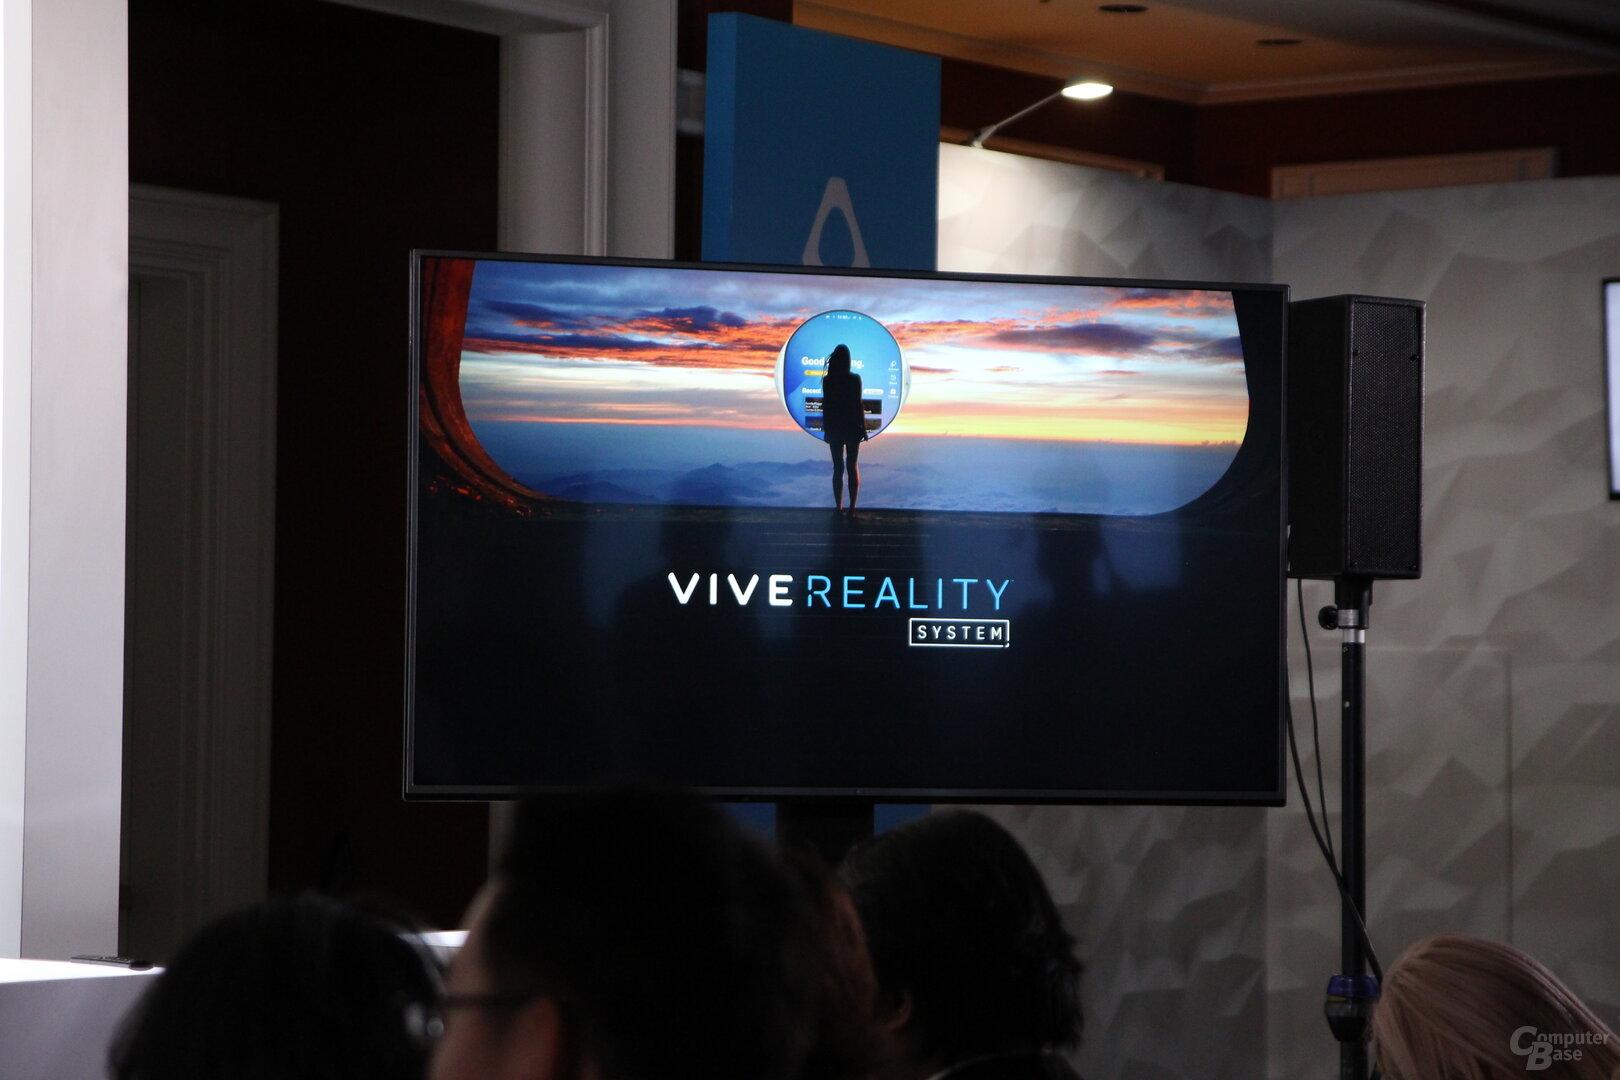 HTC Vive Reality System